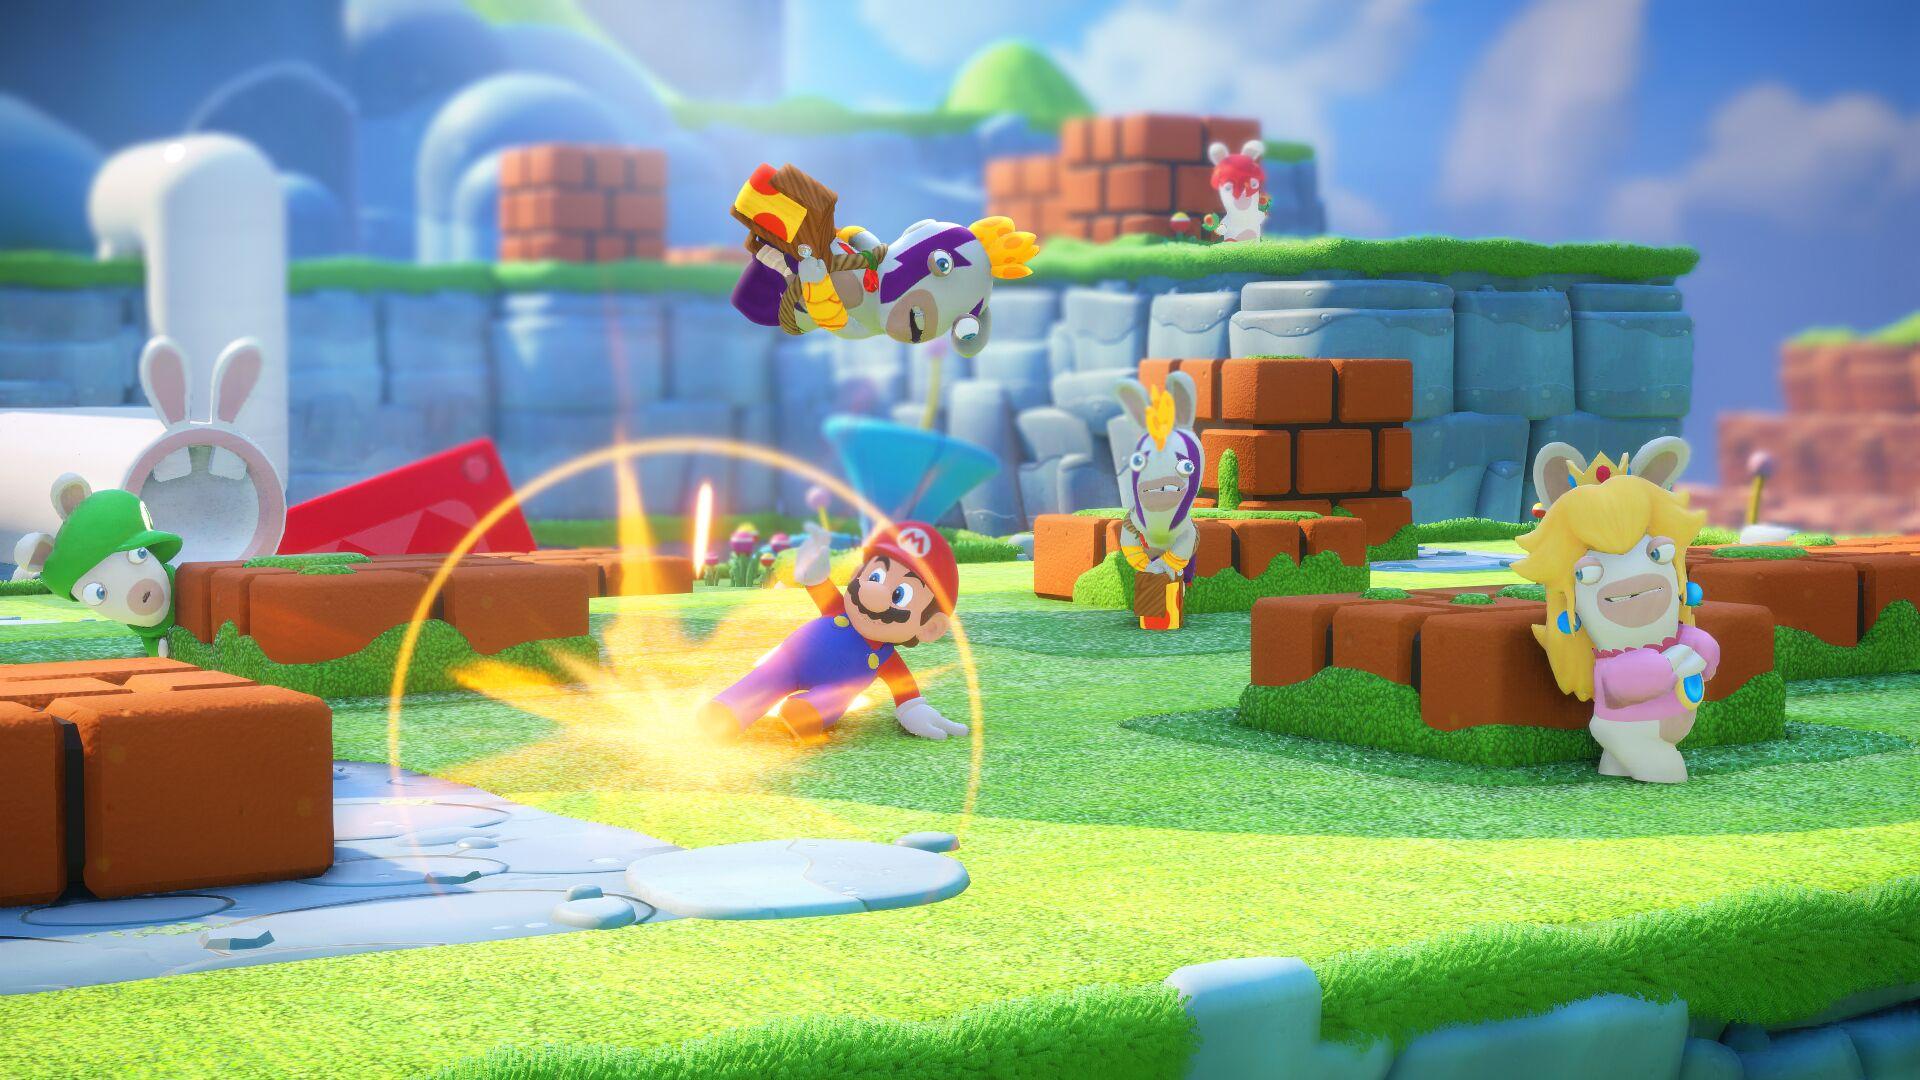 Mario + The Lapins Crétins - Lapin Peach dévoile ses talents